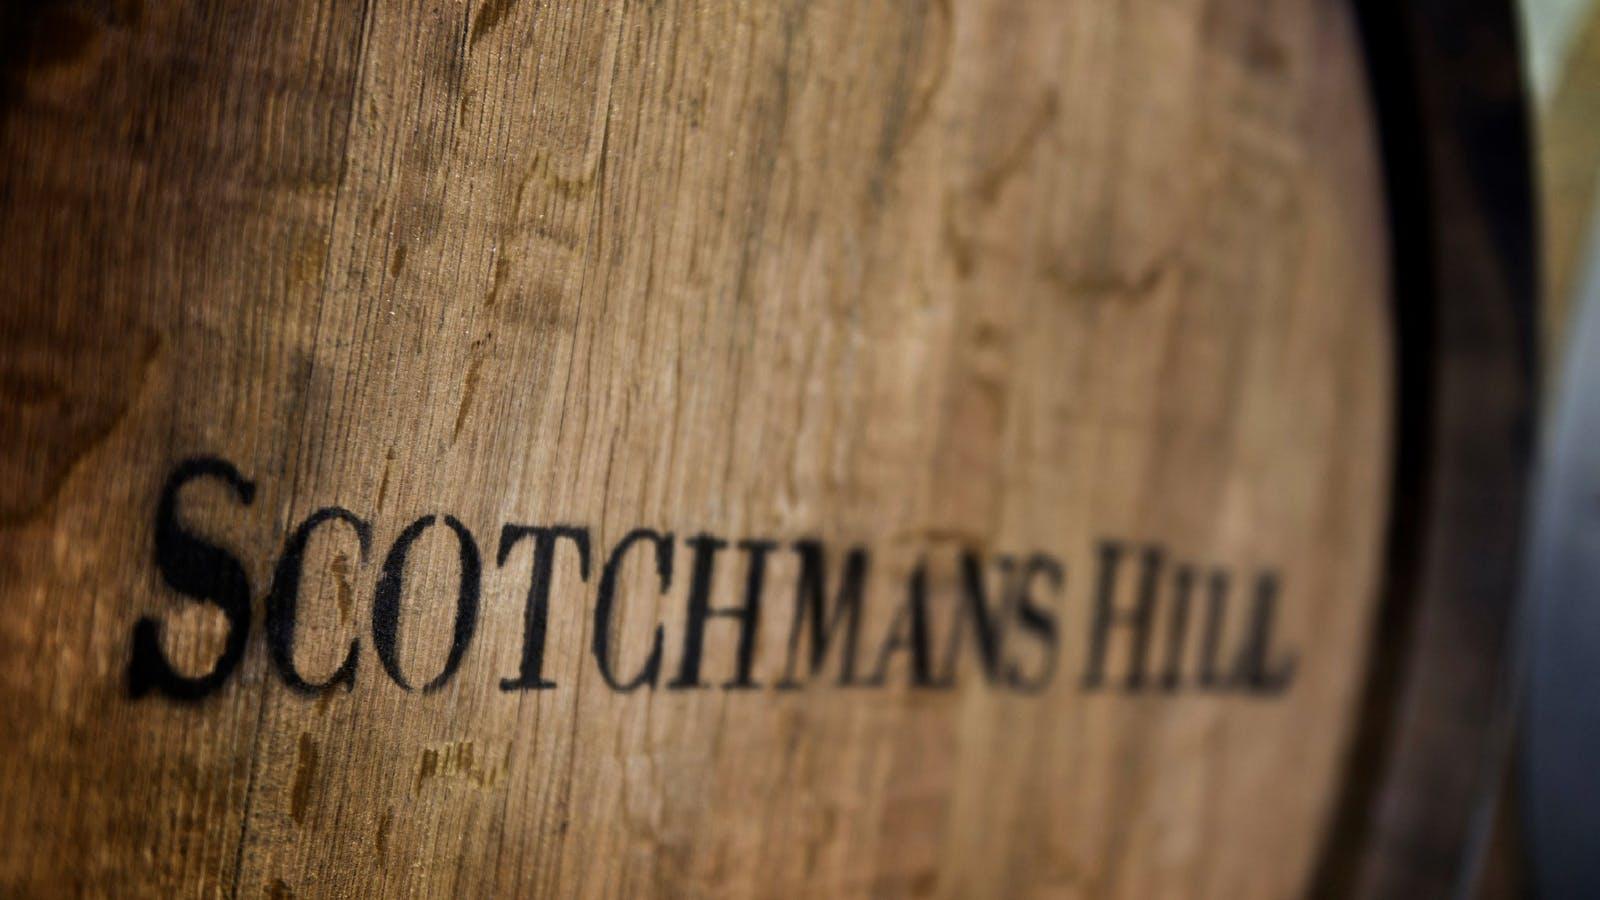 Scotchmans Hill